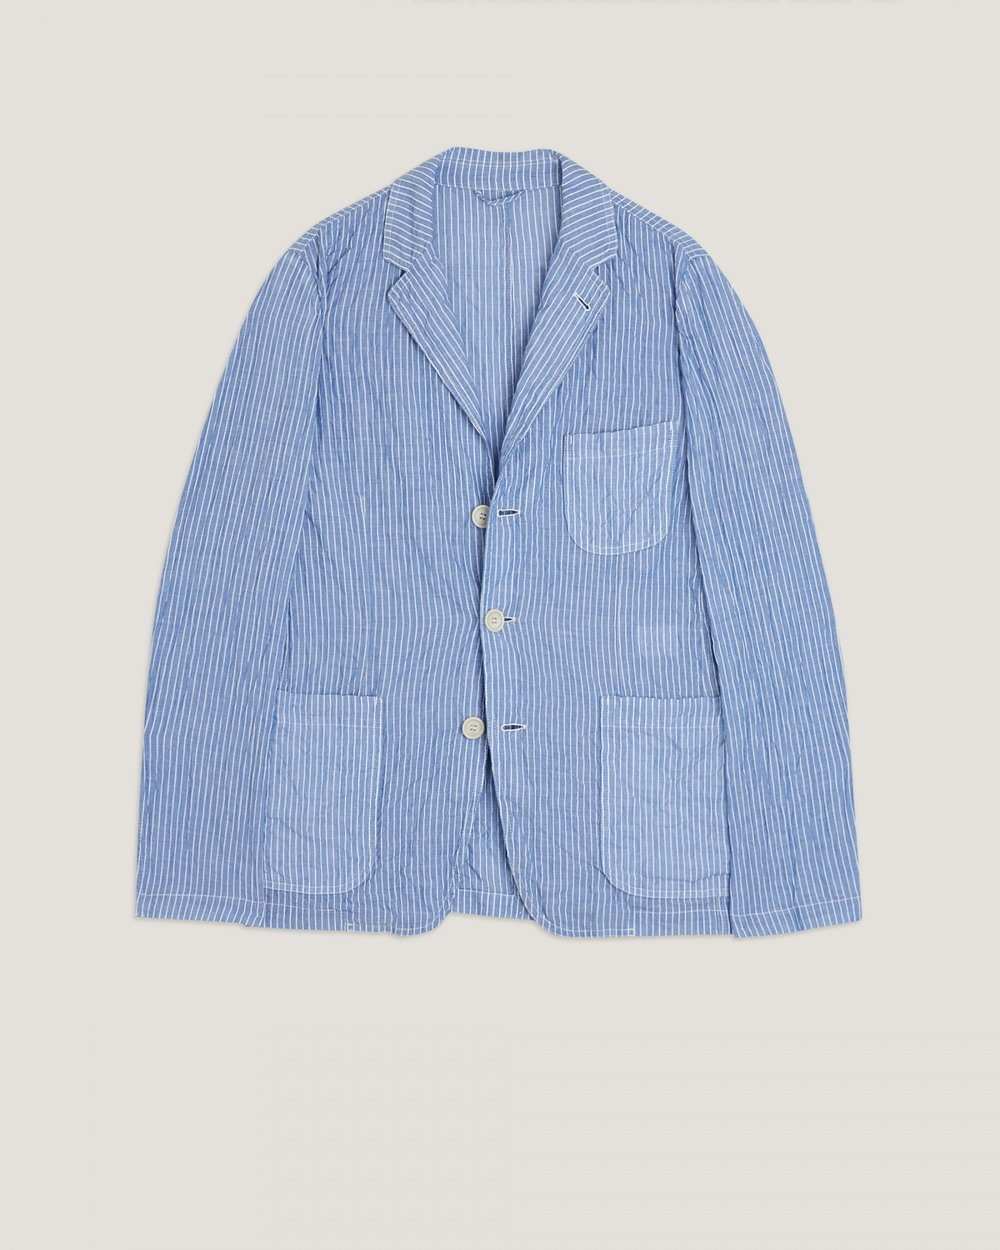 aspesi_samuraki_cotton_shirt_jacket_blue_stripe_1.jpg